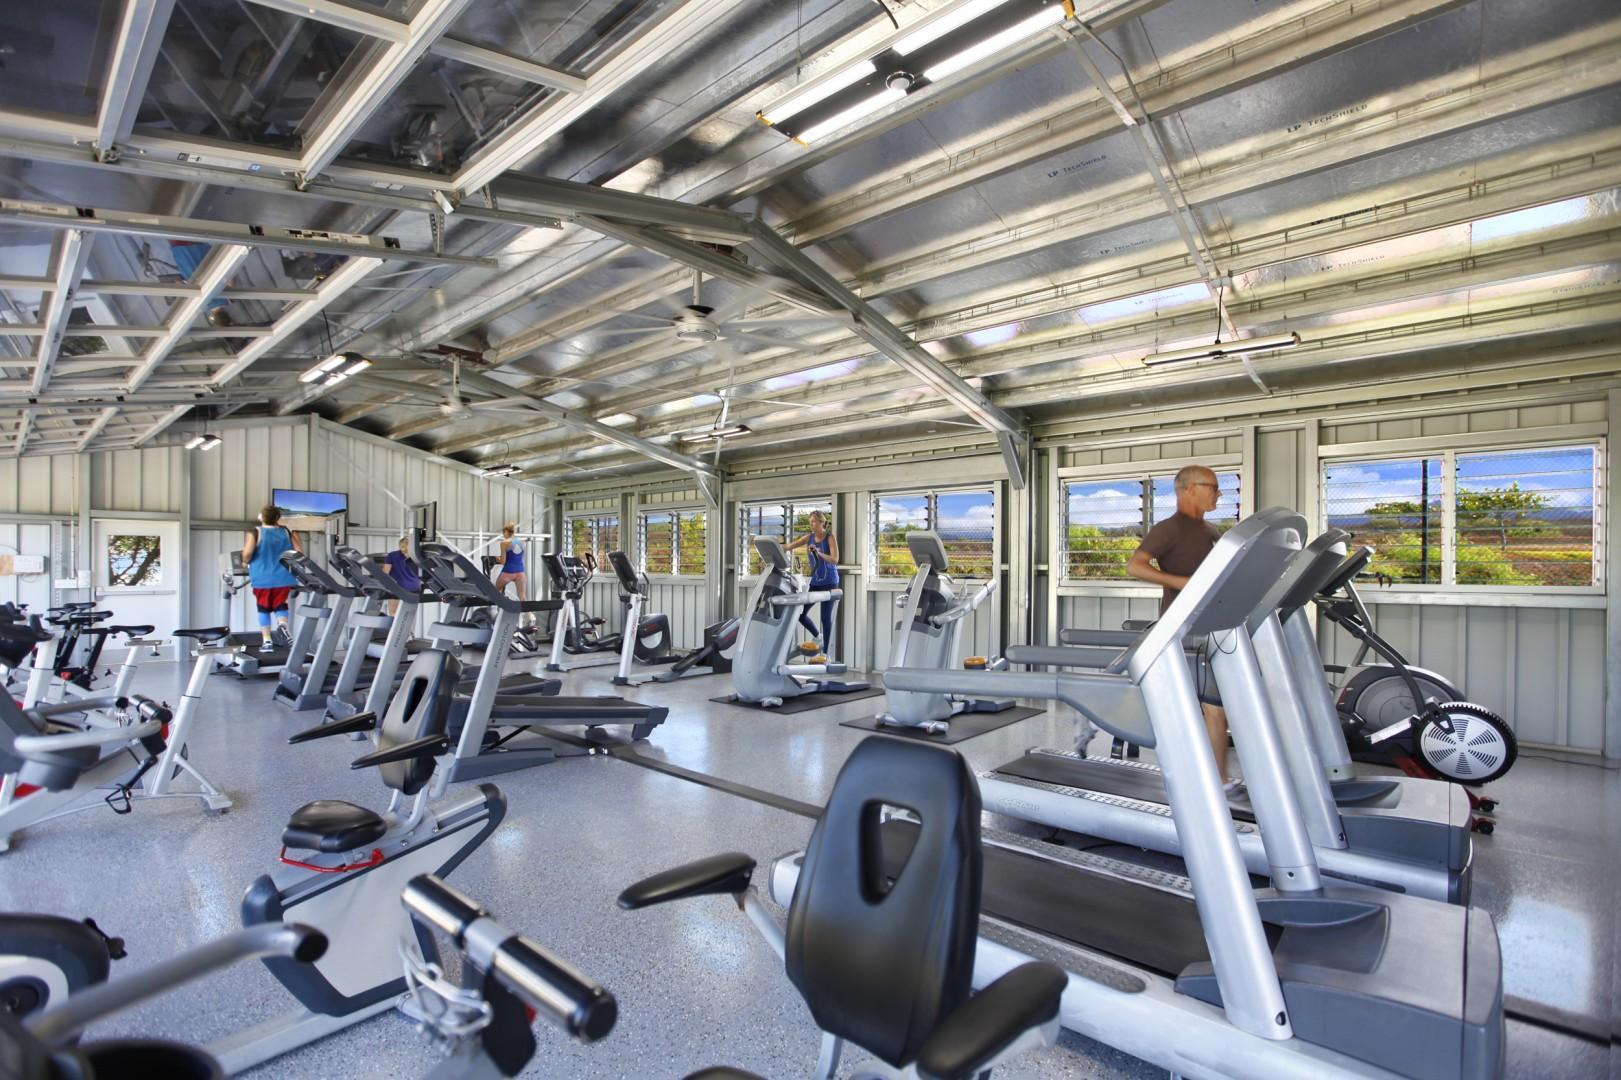 The gym at Poipu Beach Athletic Club